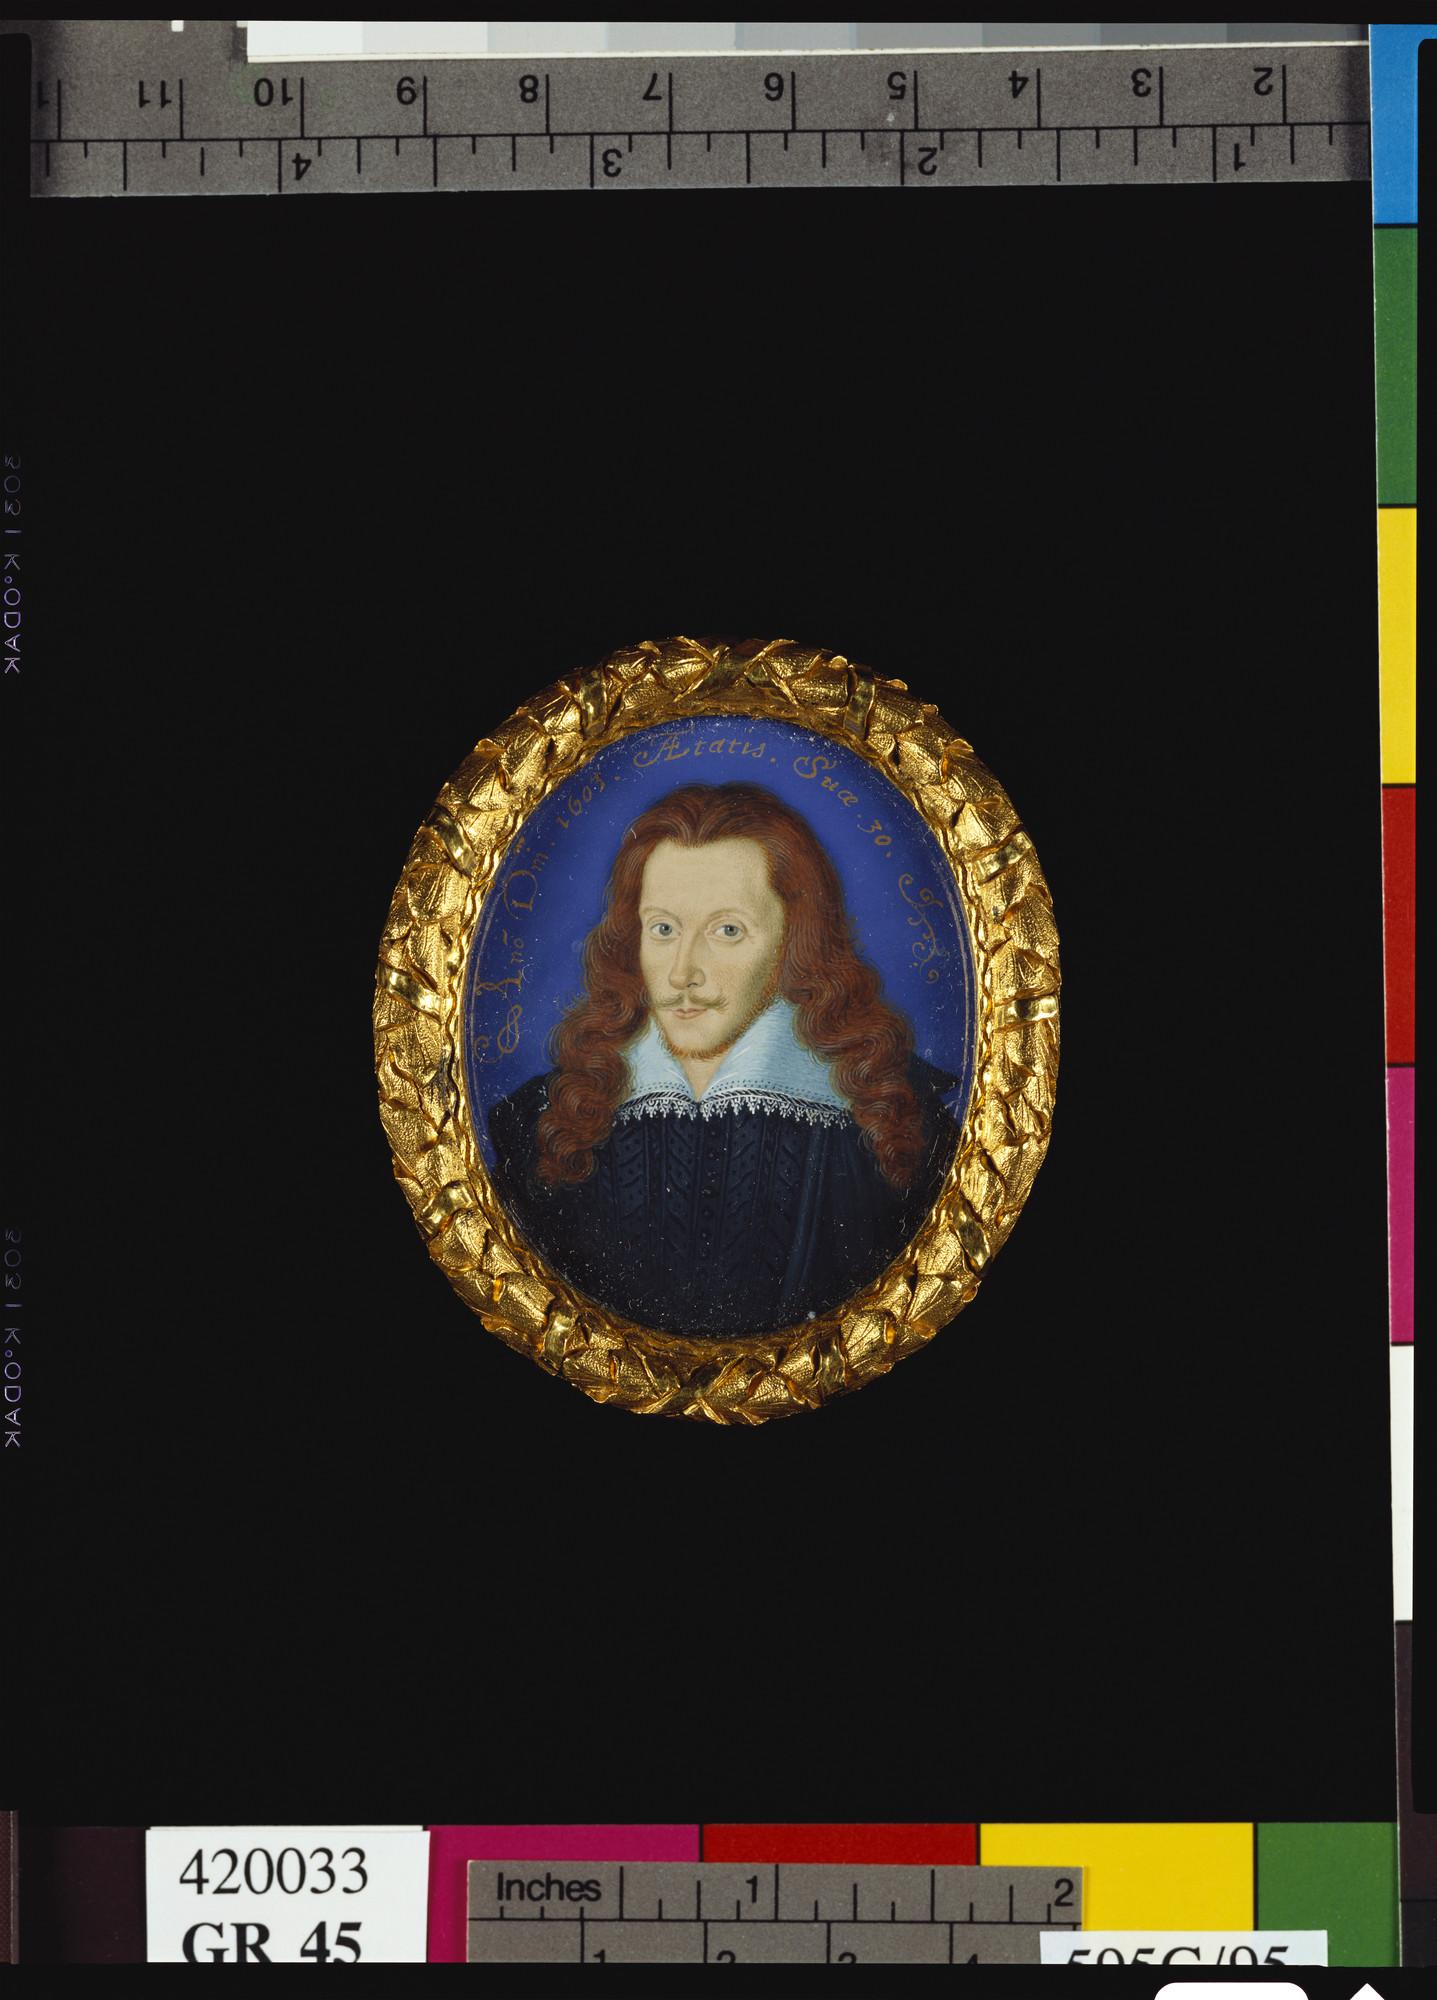 Nicholas Hilliard (1547-1619) - Henry Wriothesley, 3rd Earl of